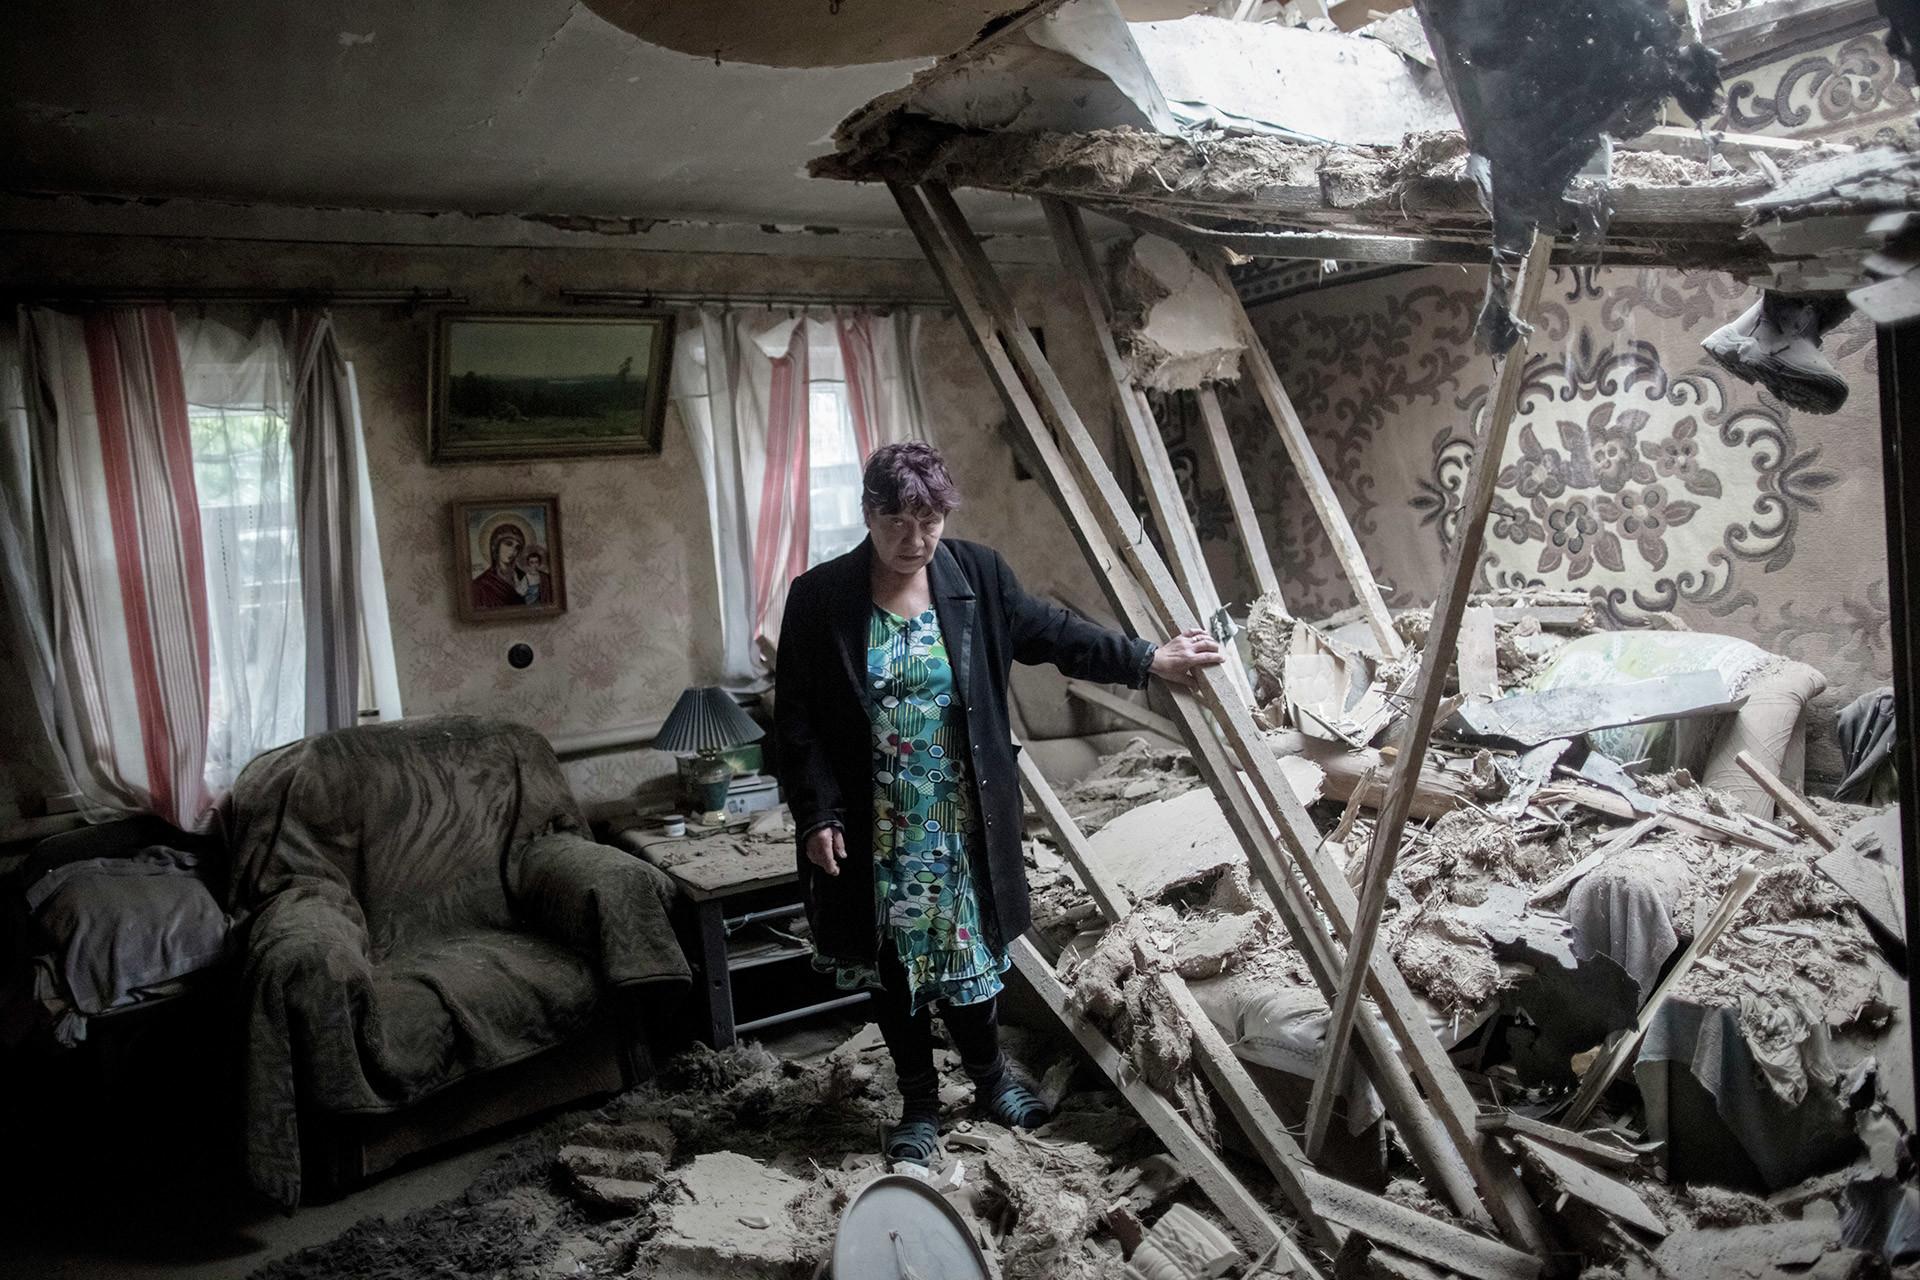 Фото ©РИА Новости/Андрей Стенин